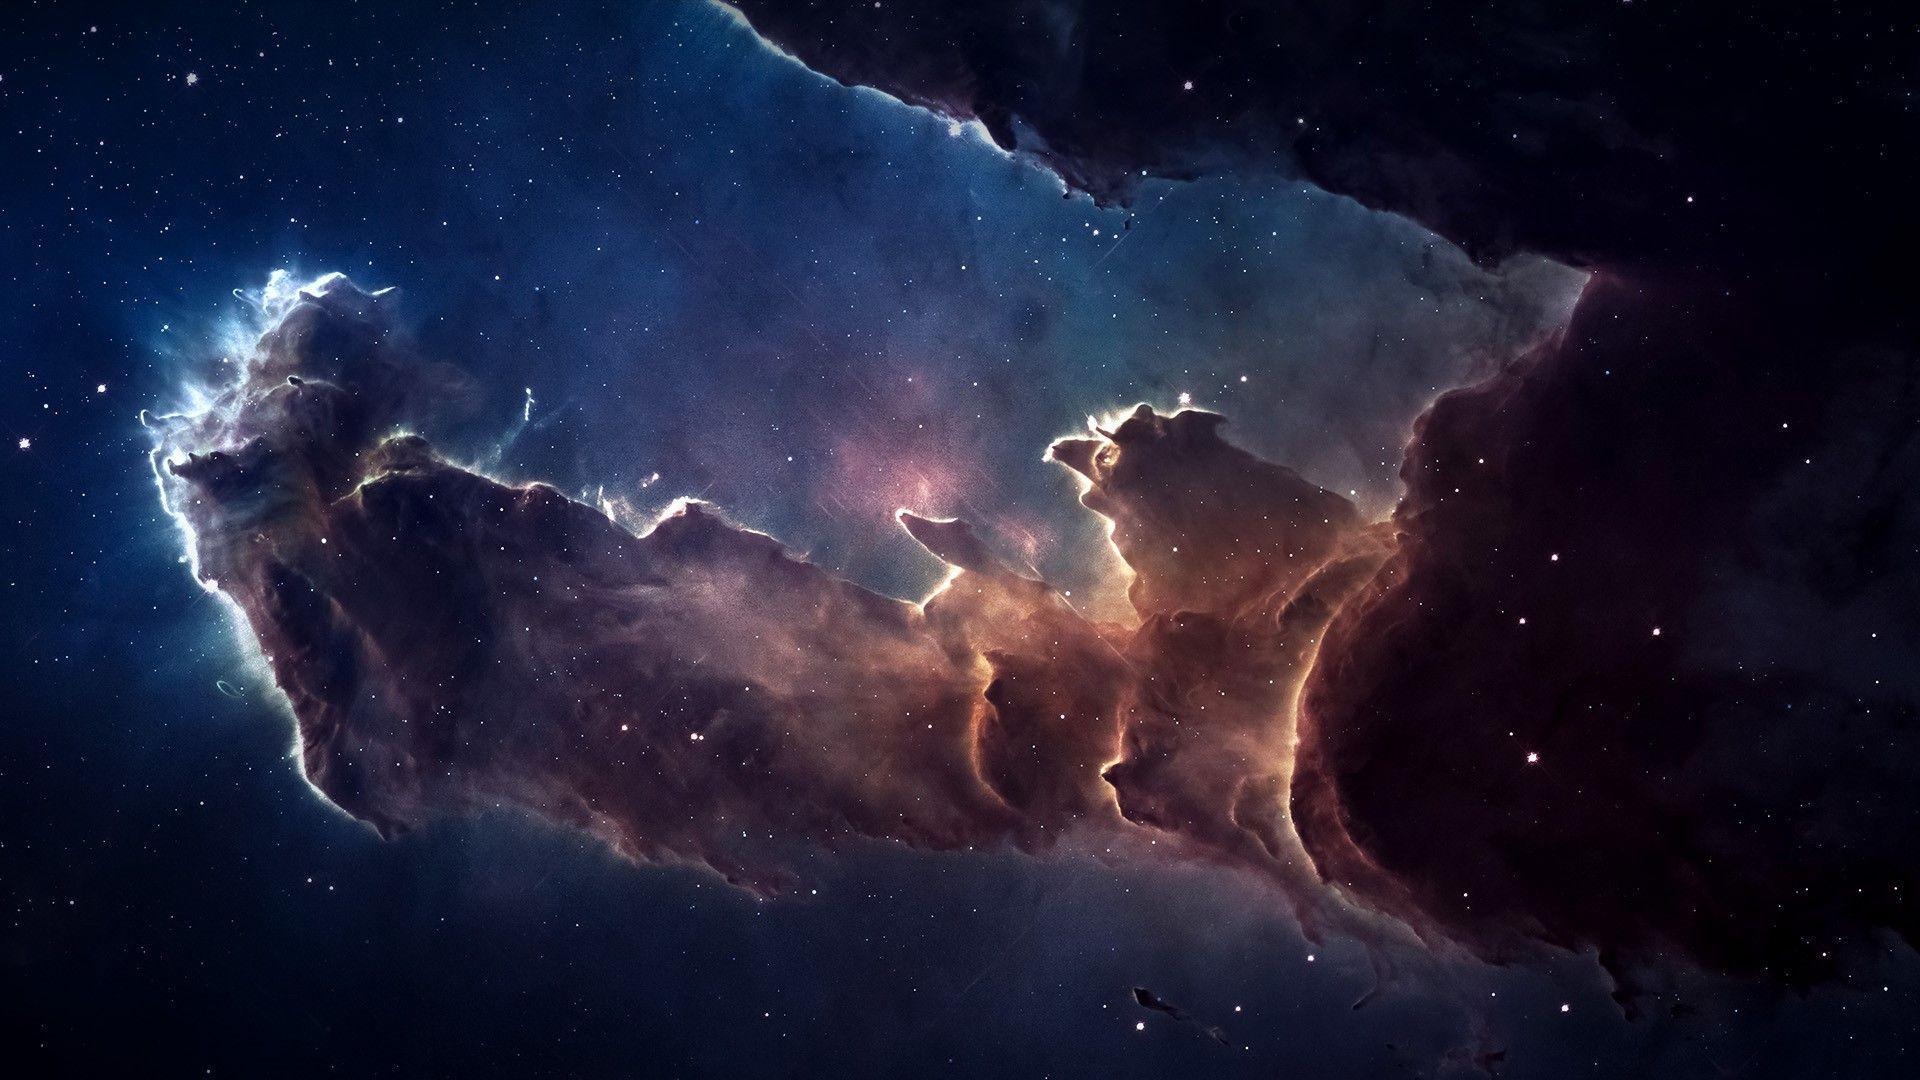 Pillars of Creation Wallpapers - Top Free Pillars of ...